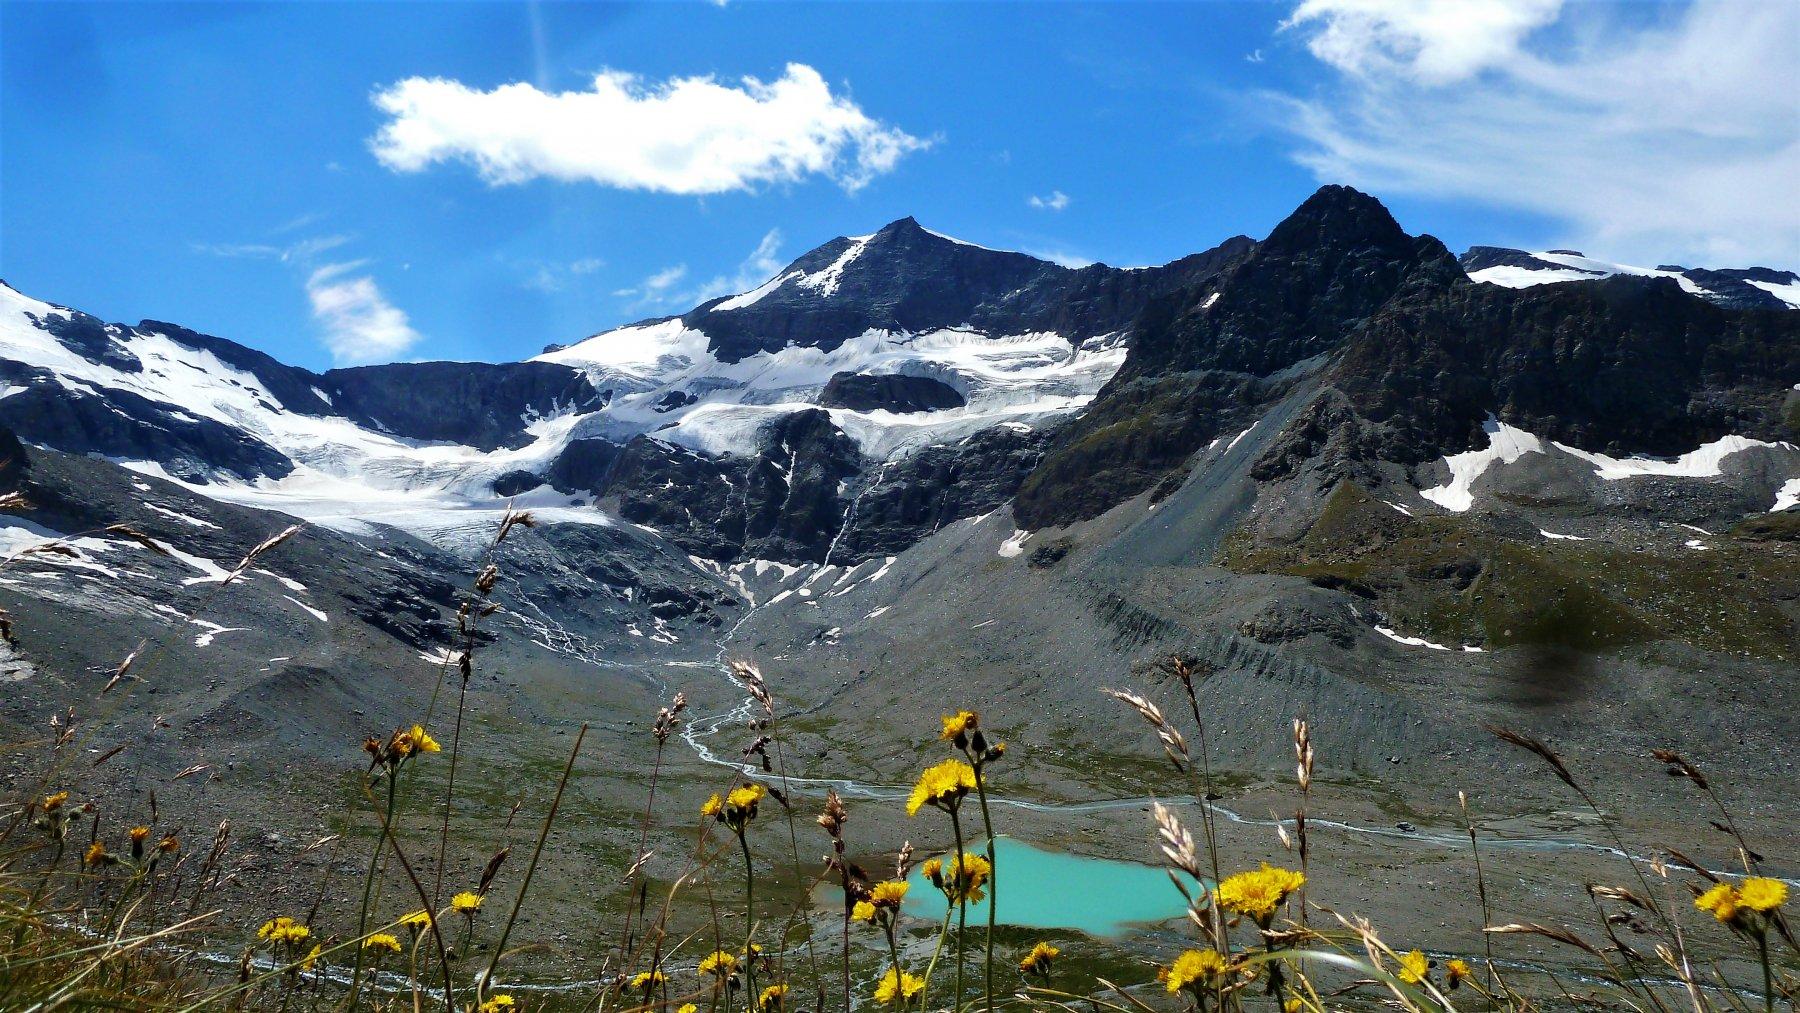 Grand Mean (Lac du) o Lac Nouveau da l'Ecot per il Refuge des Evettes e le cascate de la Recula 2018-08-11